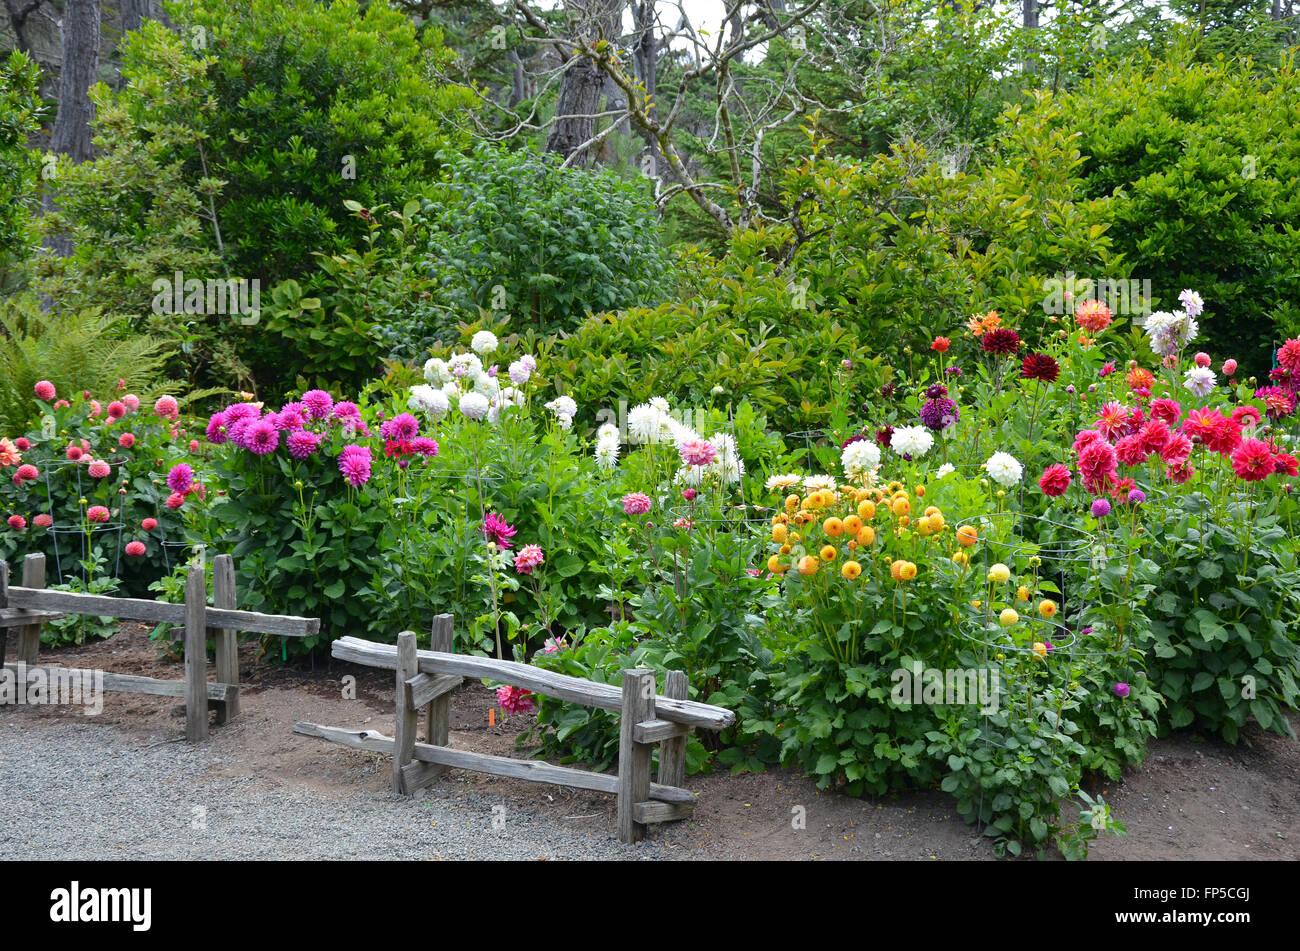 Colorful Dahlia Flower Garden In Lush Green Park Stock Photo Alamy